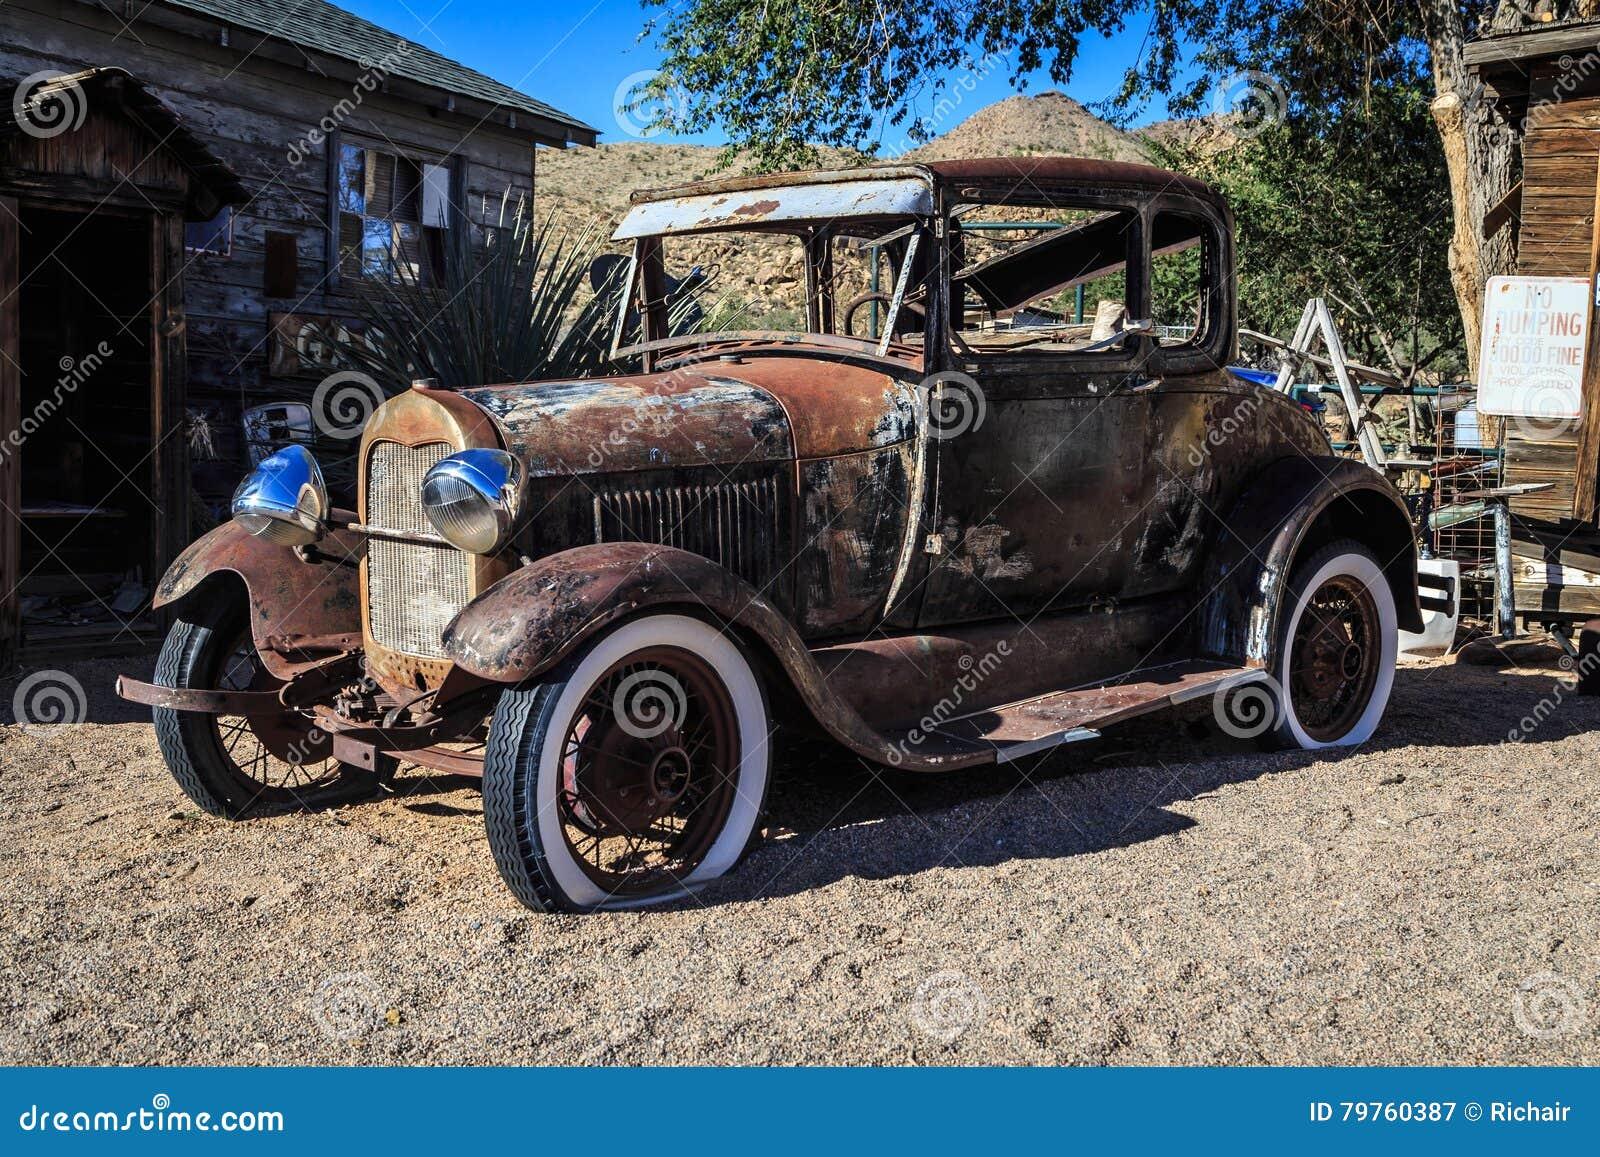 Rusty old car stock image. Image of historical, nostalgia - 79760387